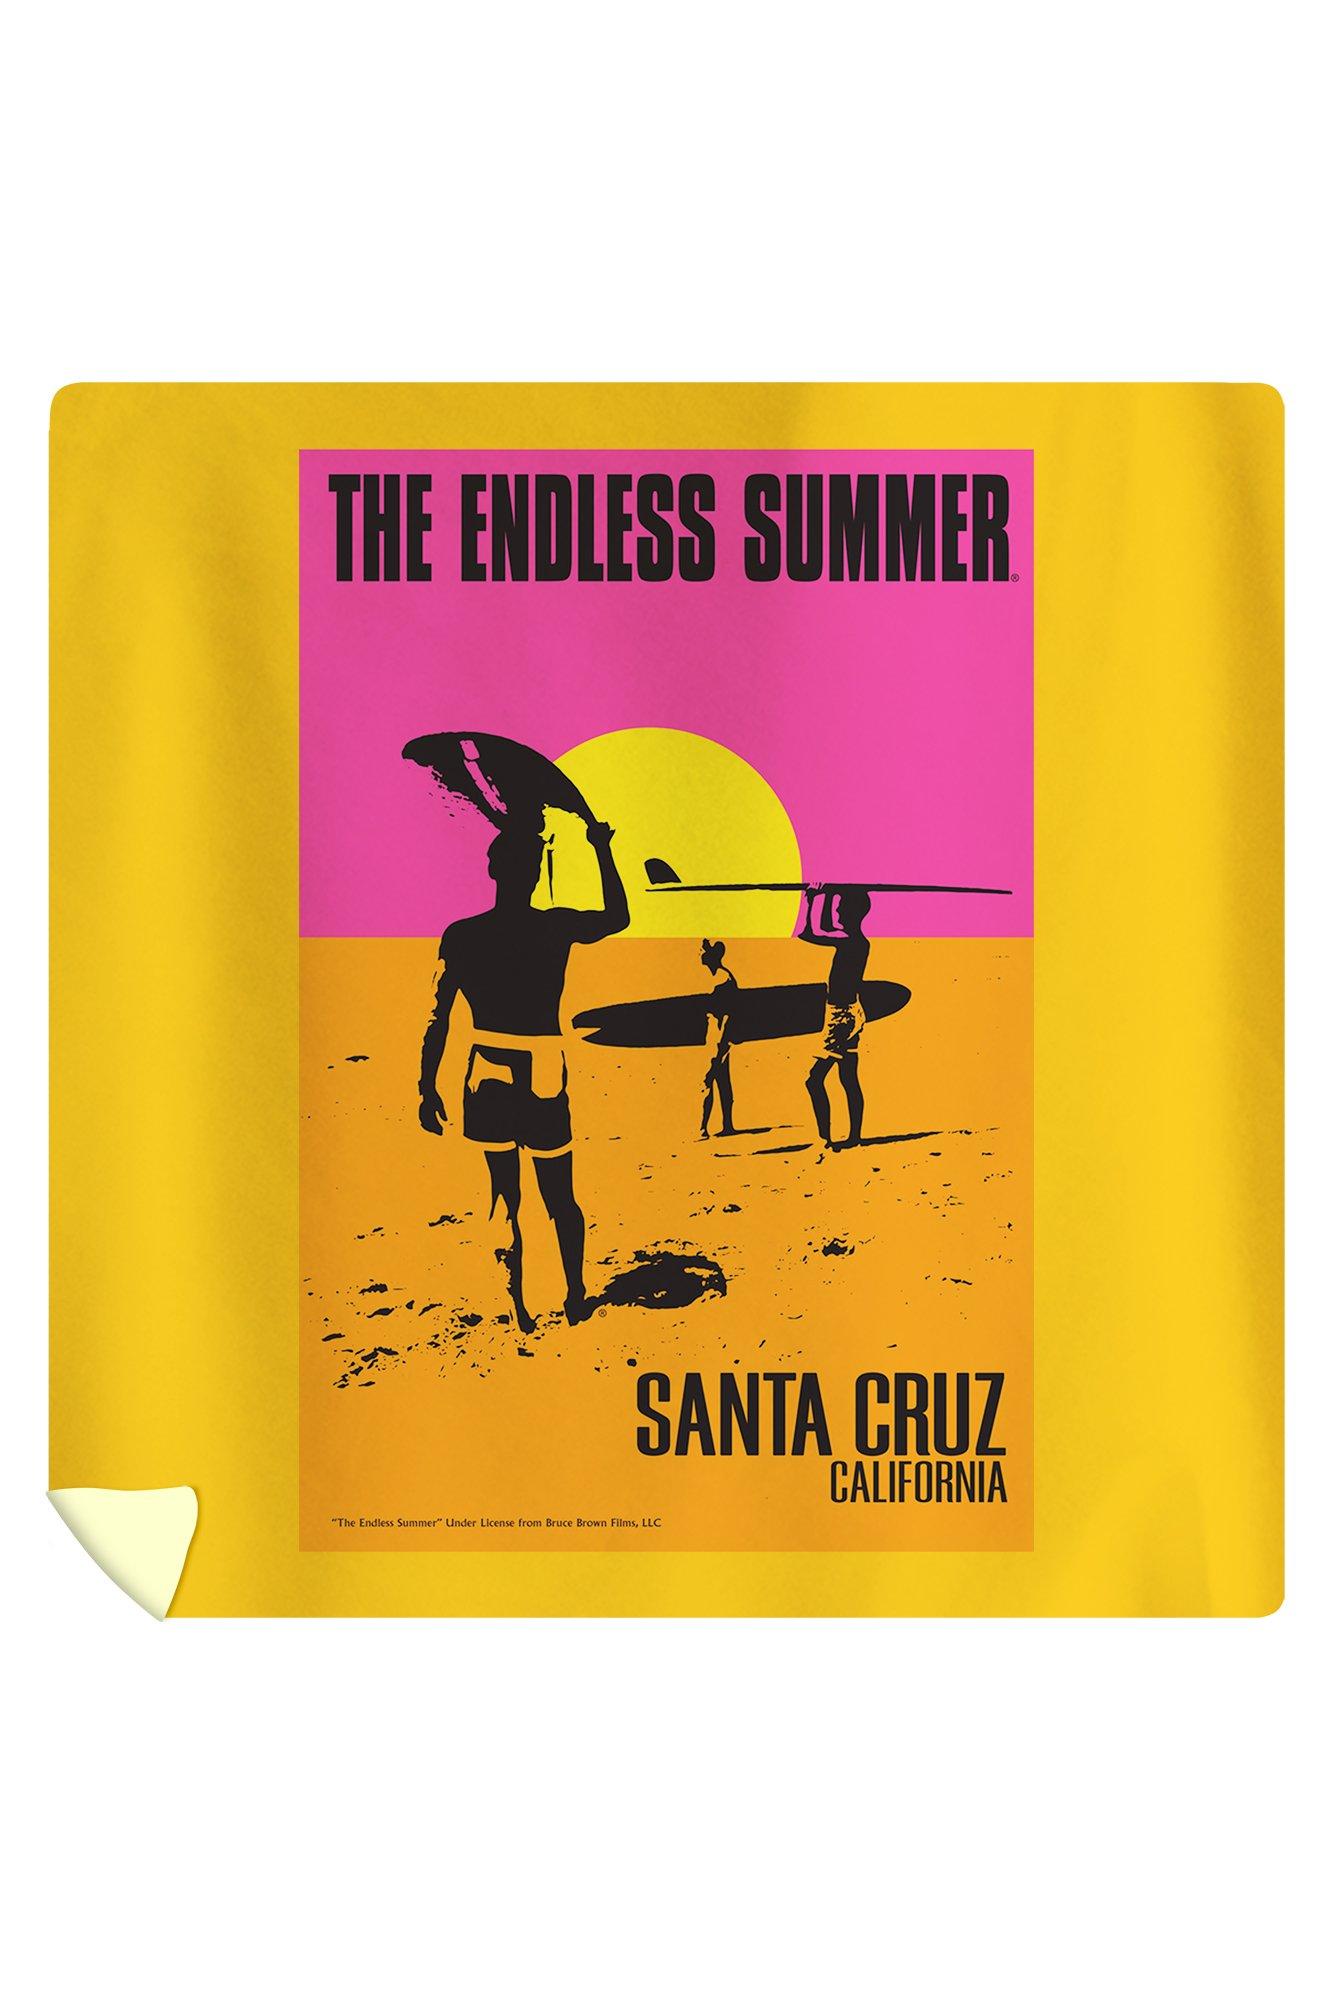 Santa Cruz, California - The Endless Summer - Original Movie Poster (88x88 Queen Microfiber Duvet Cover)